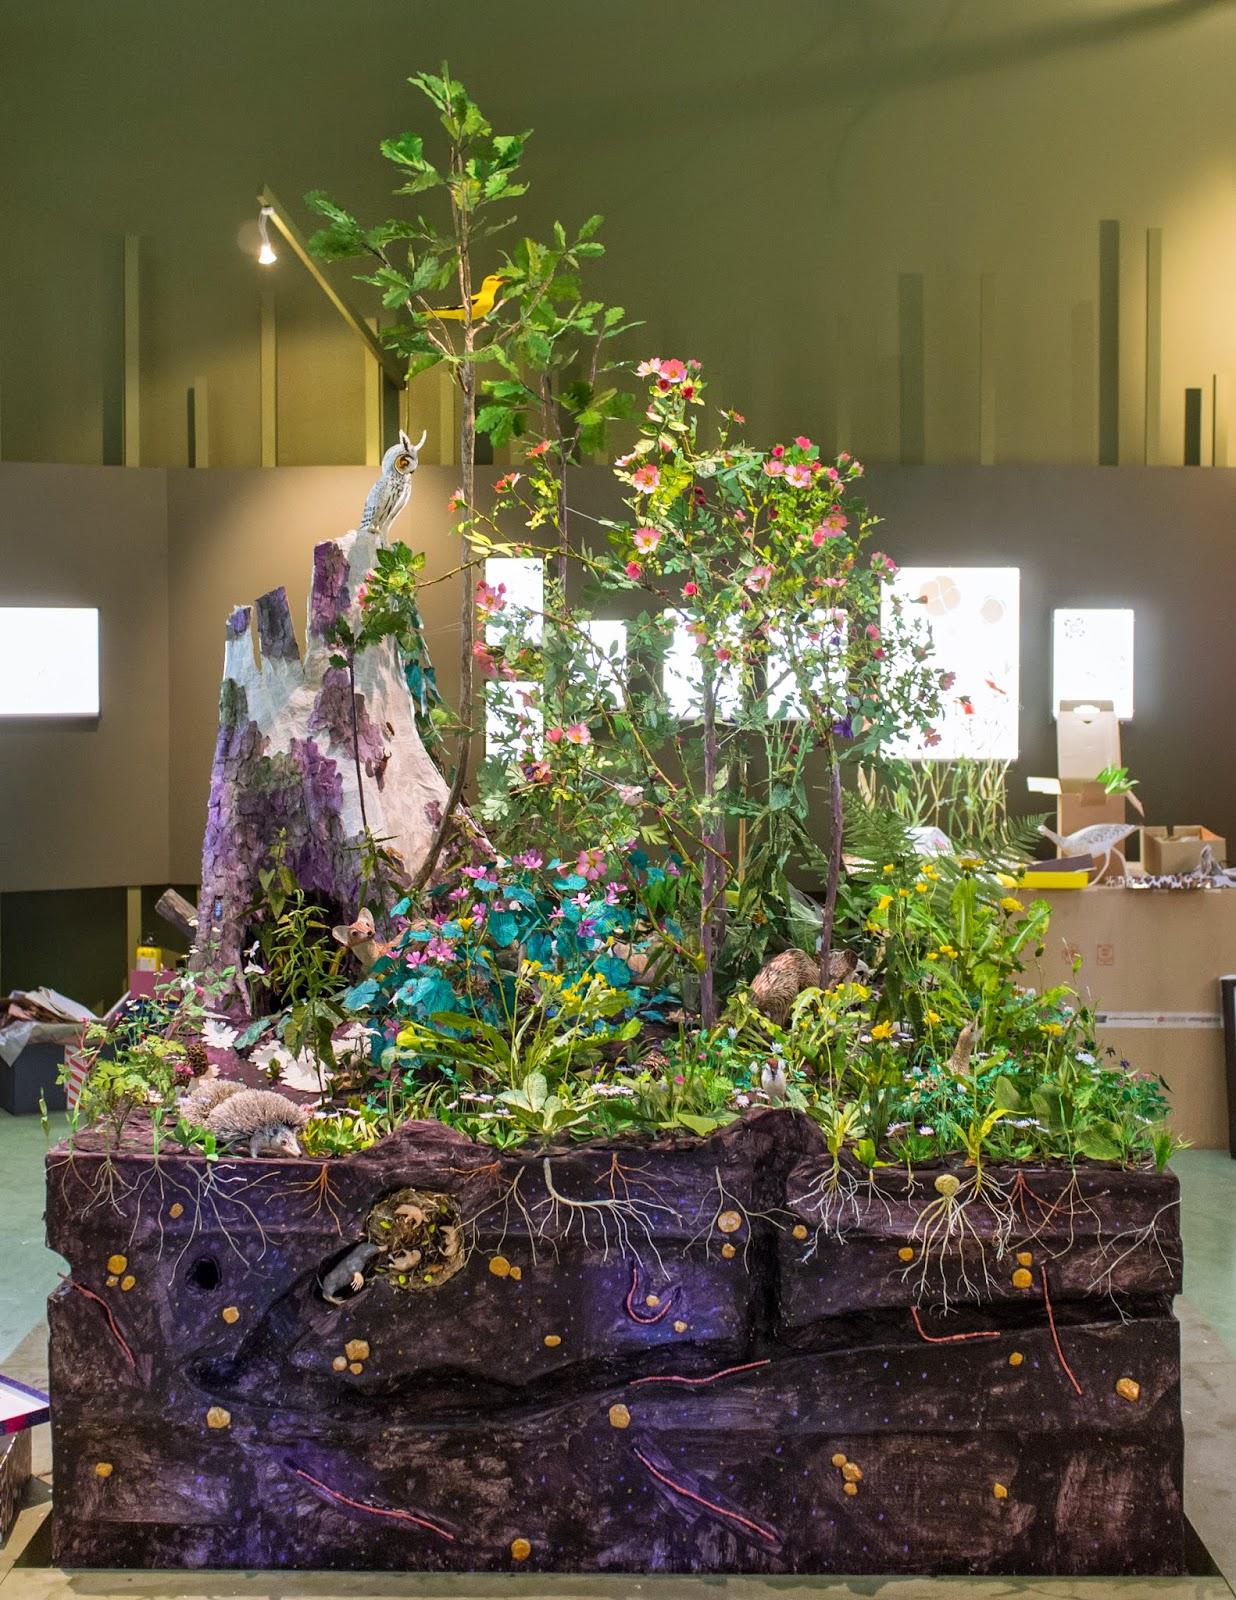 Exposition fleurs en campagne, Bagatelle, Anne-Lise Koehler